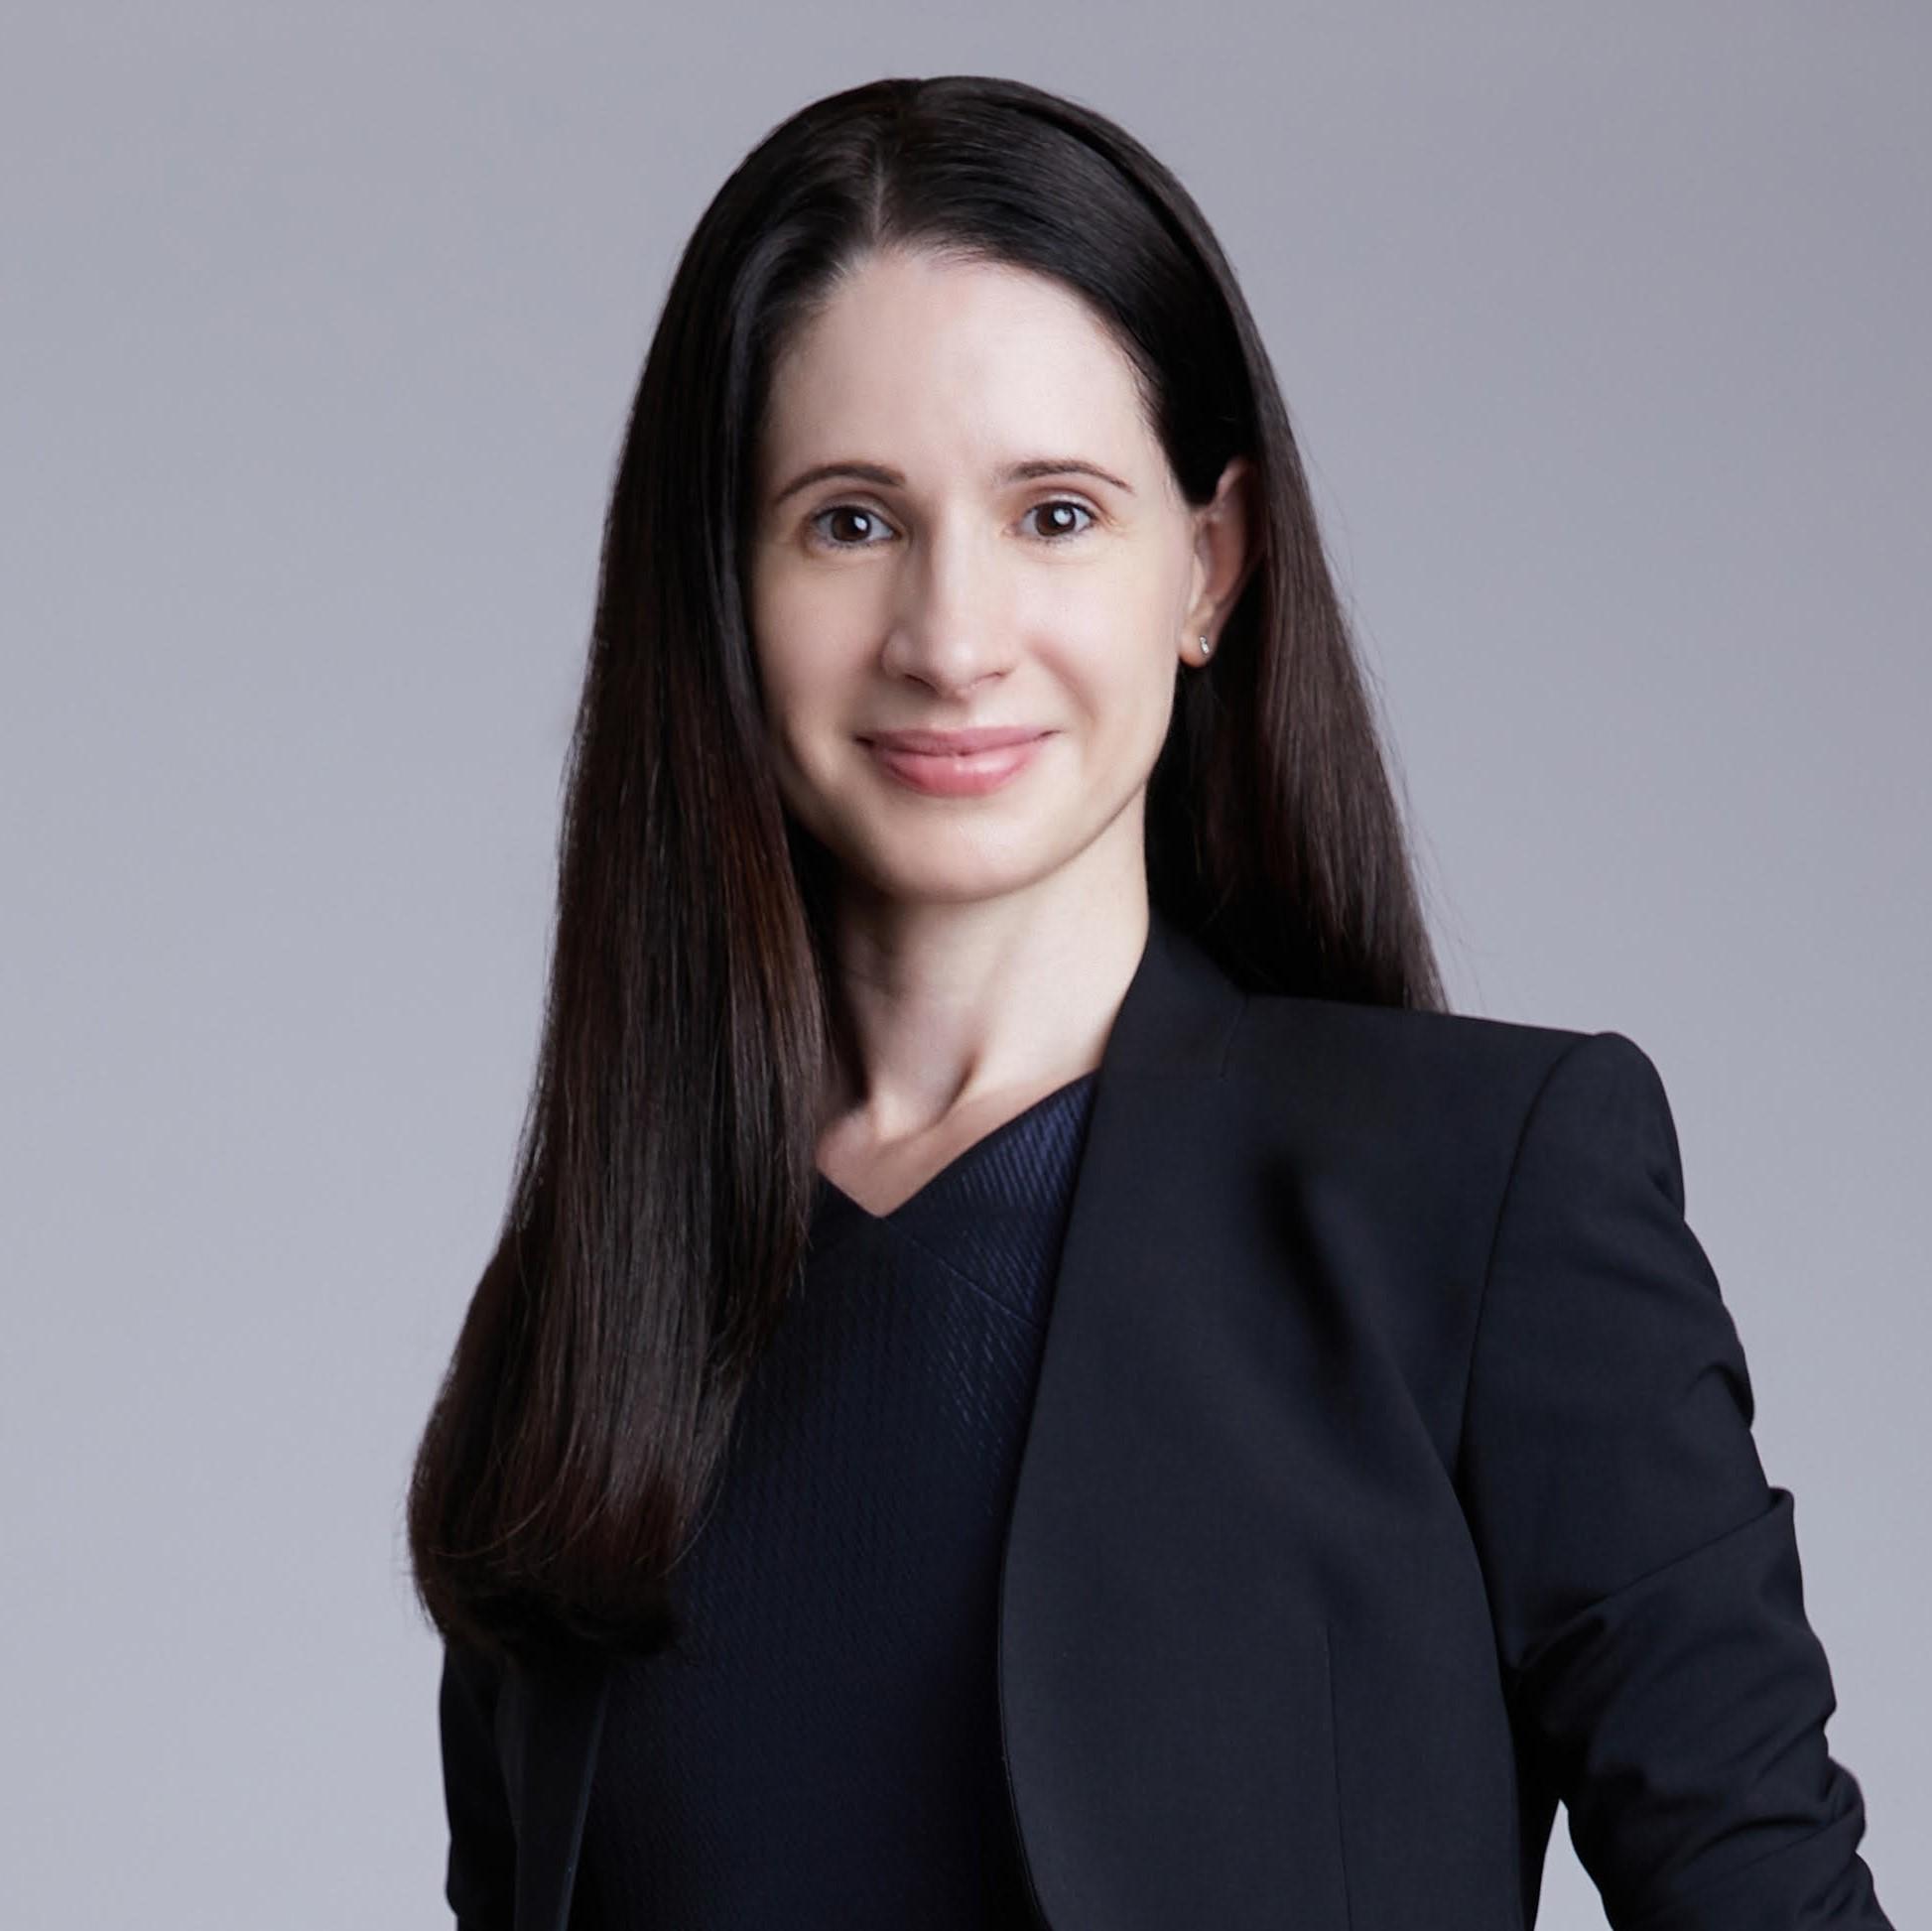 Karina Dobarro